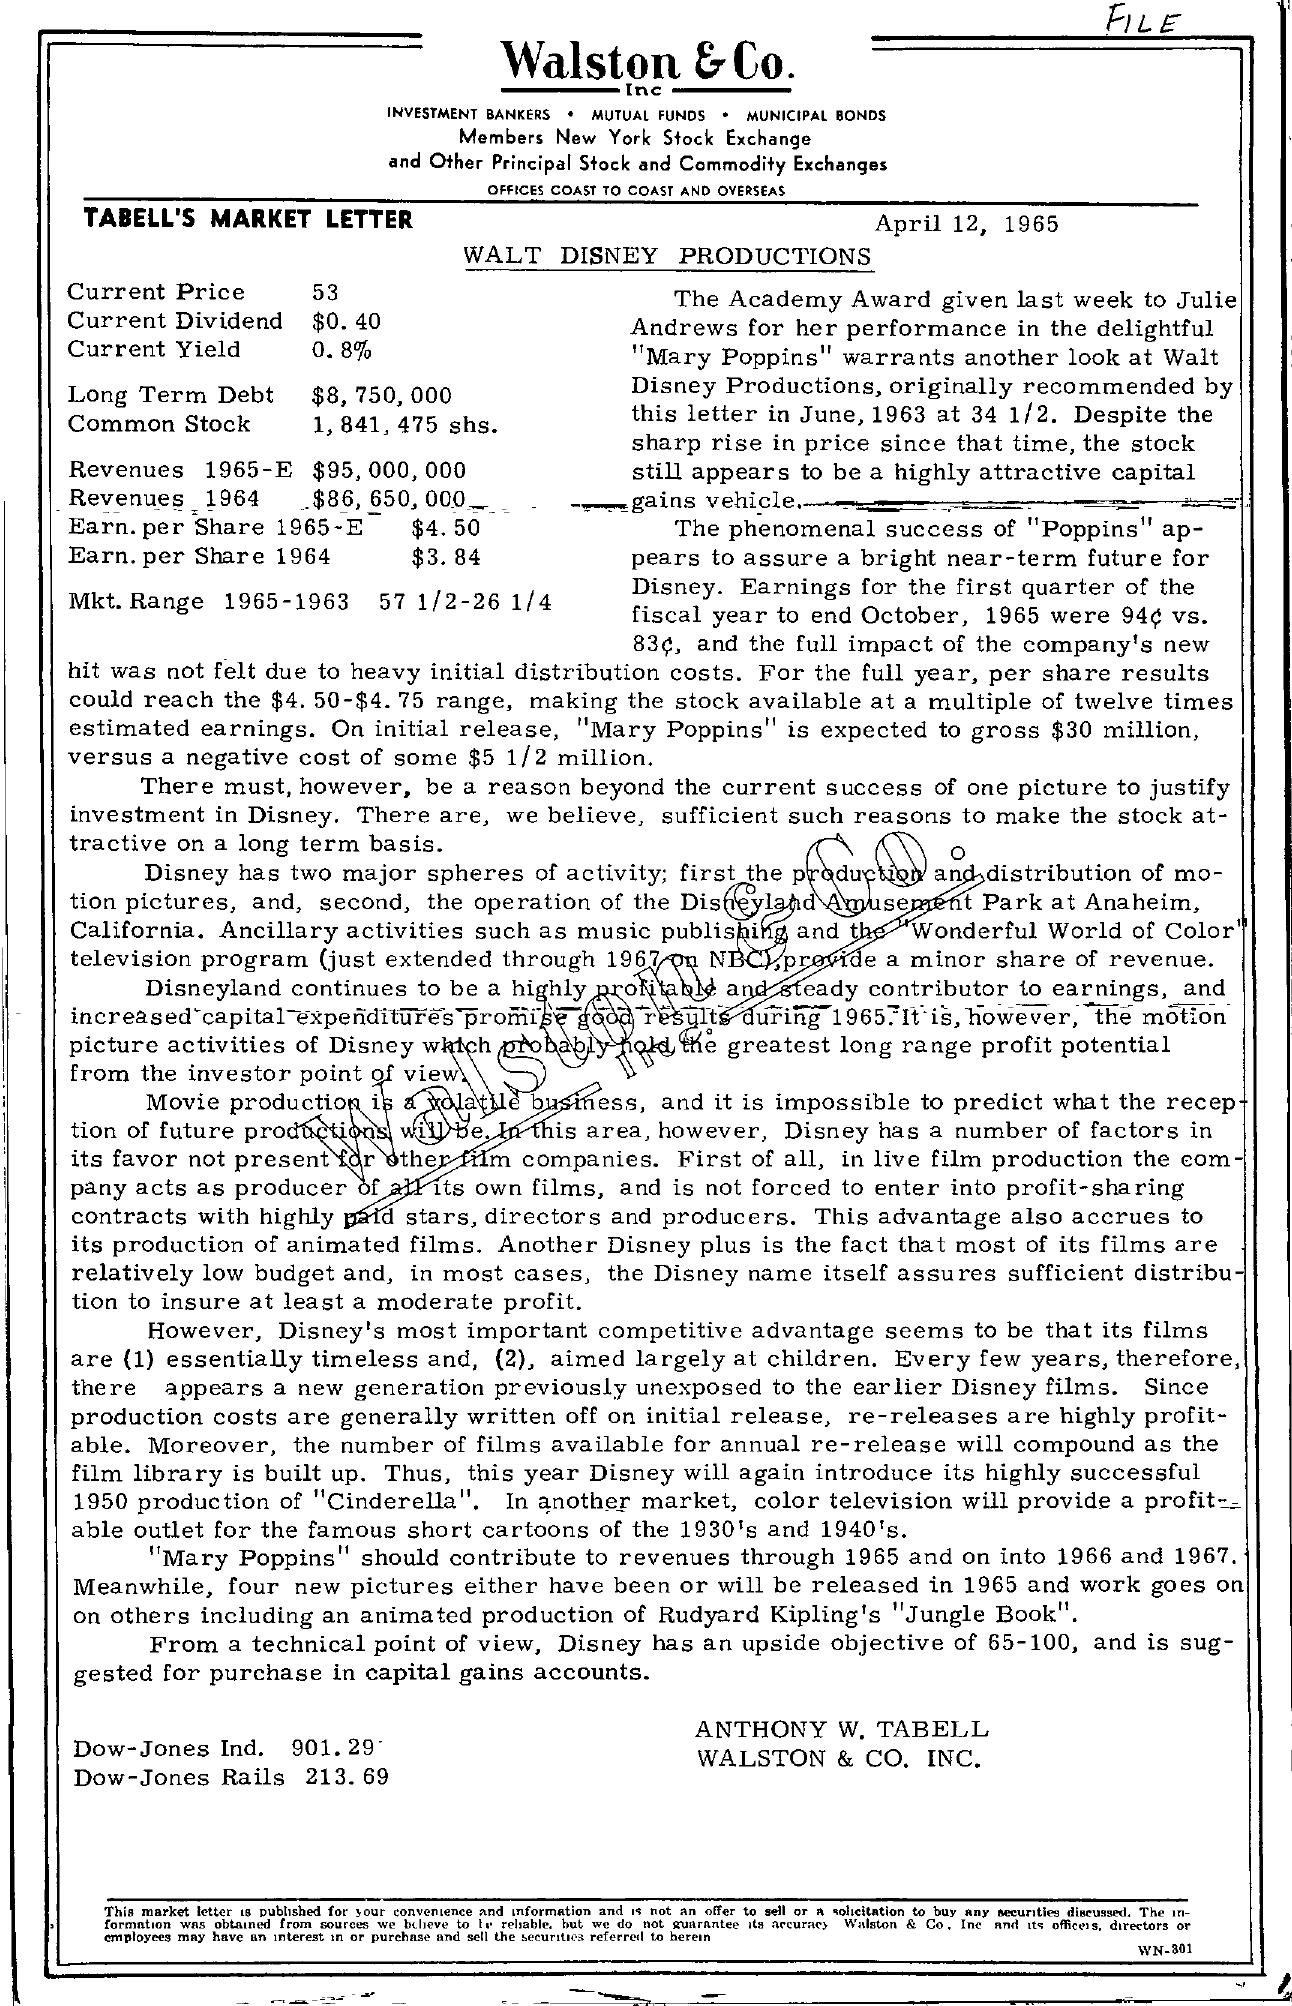 Tabell's Market Letter - April 12, 1965